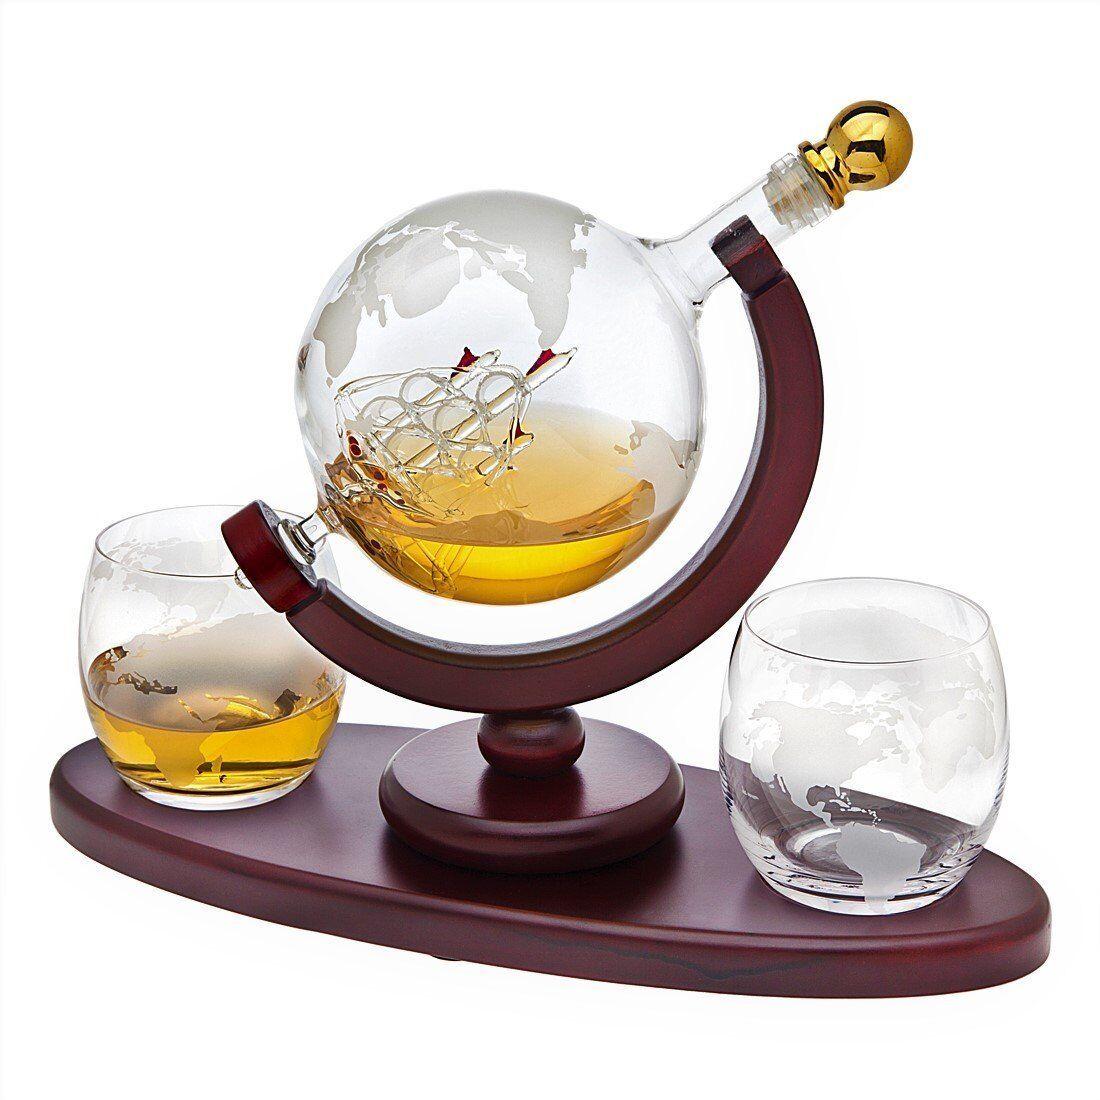 Decantador De Cristal Tipo Globo Terráqueo Set De Whisky Y Bebidas Alcohólicas